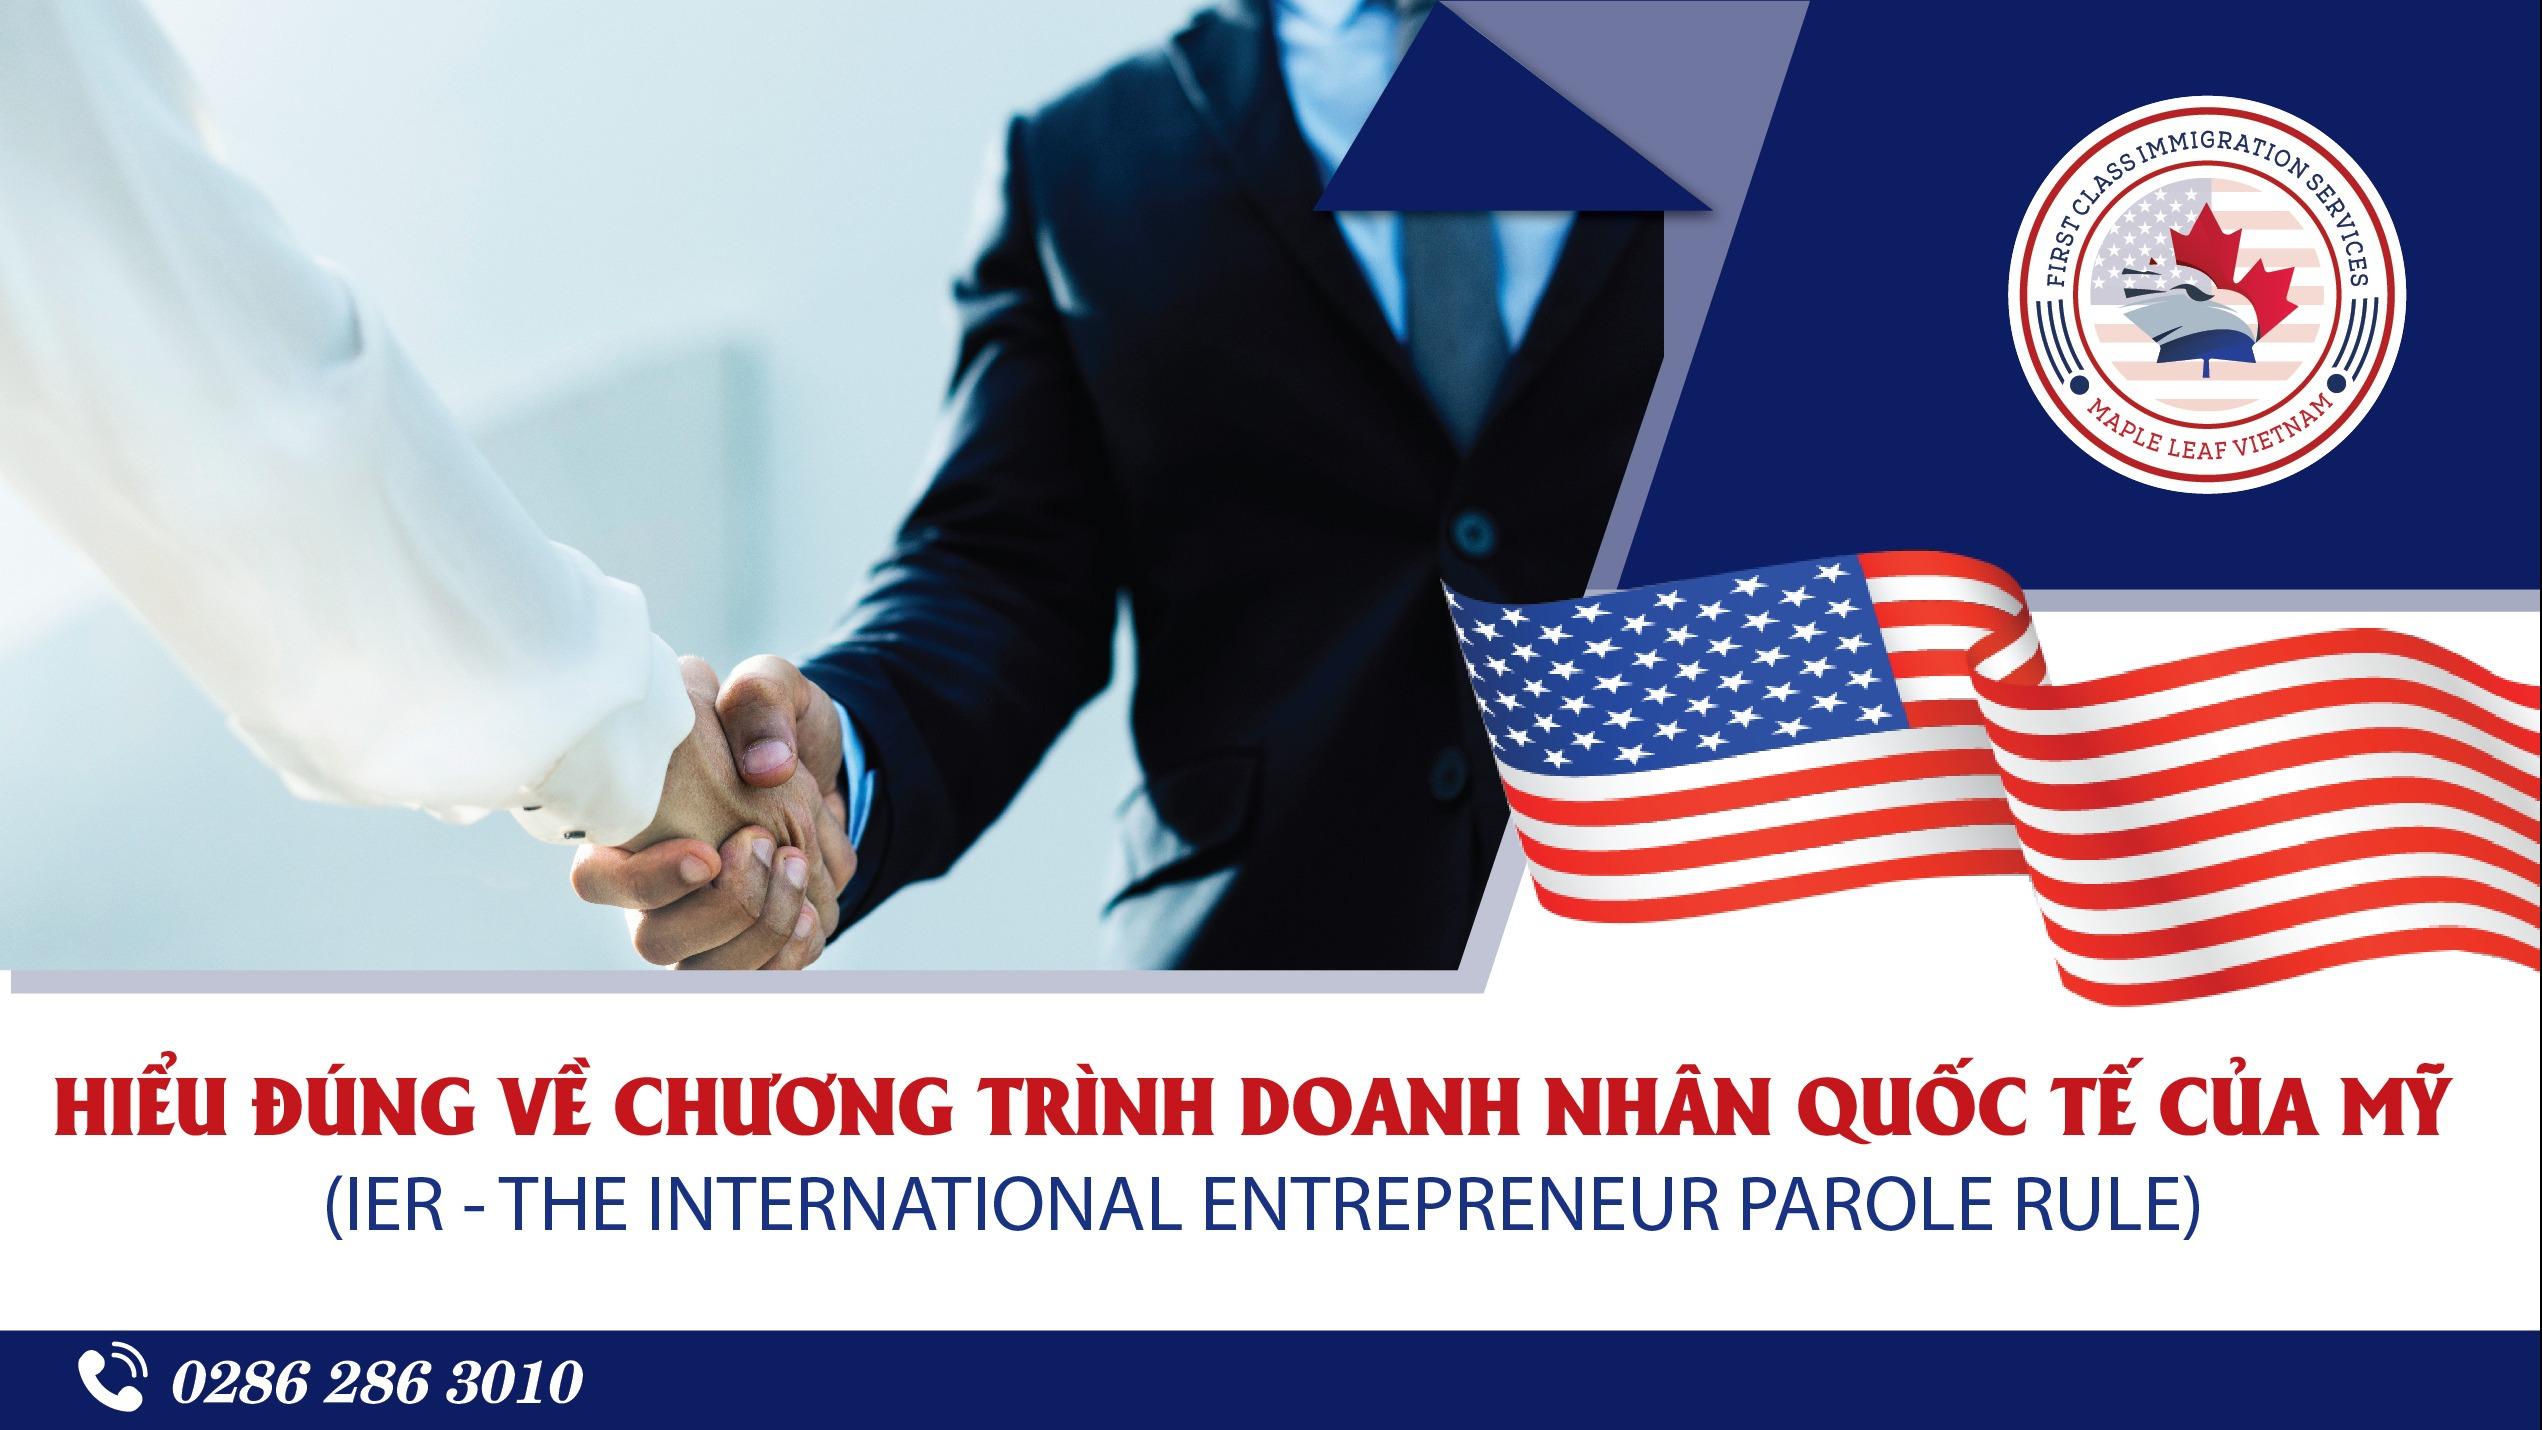 hieu-dung-ve-chuong-trinh-doanh-nhan-quoc-te-cua-my-ier---the-international-entrepreneur-parole-rule